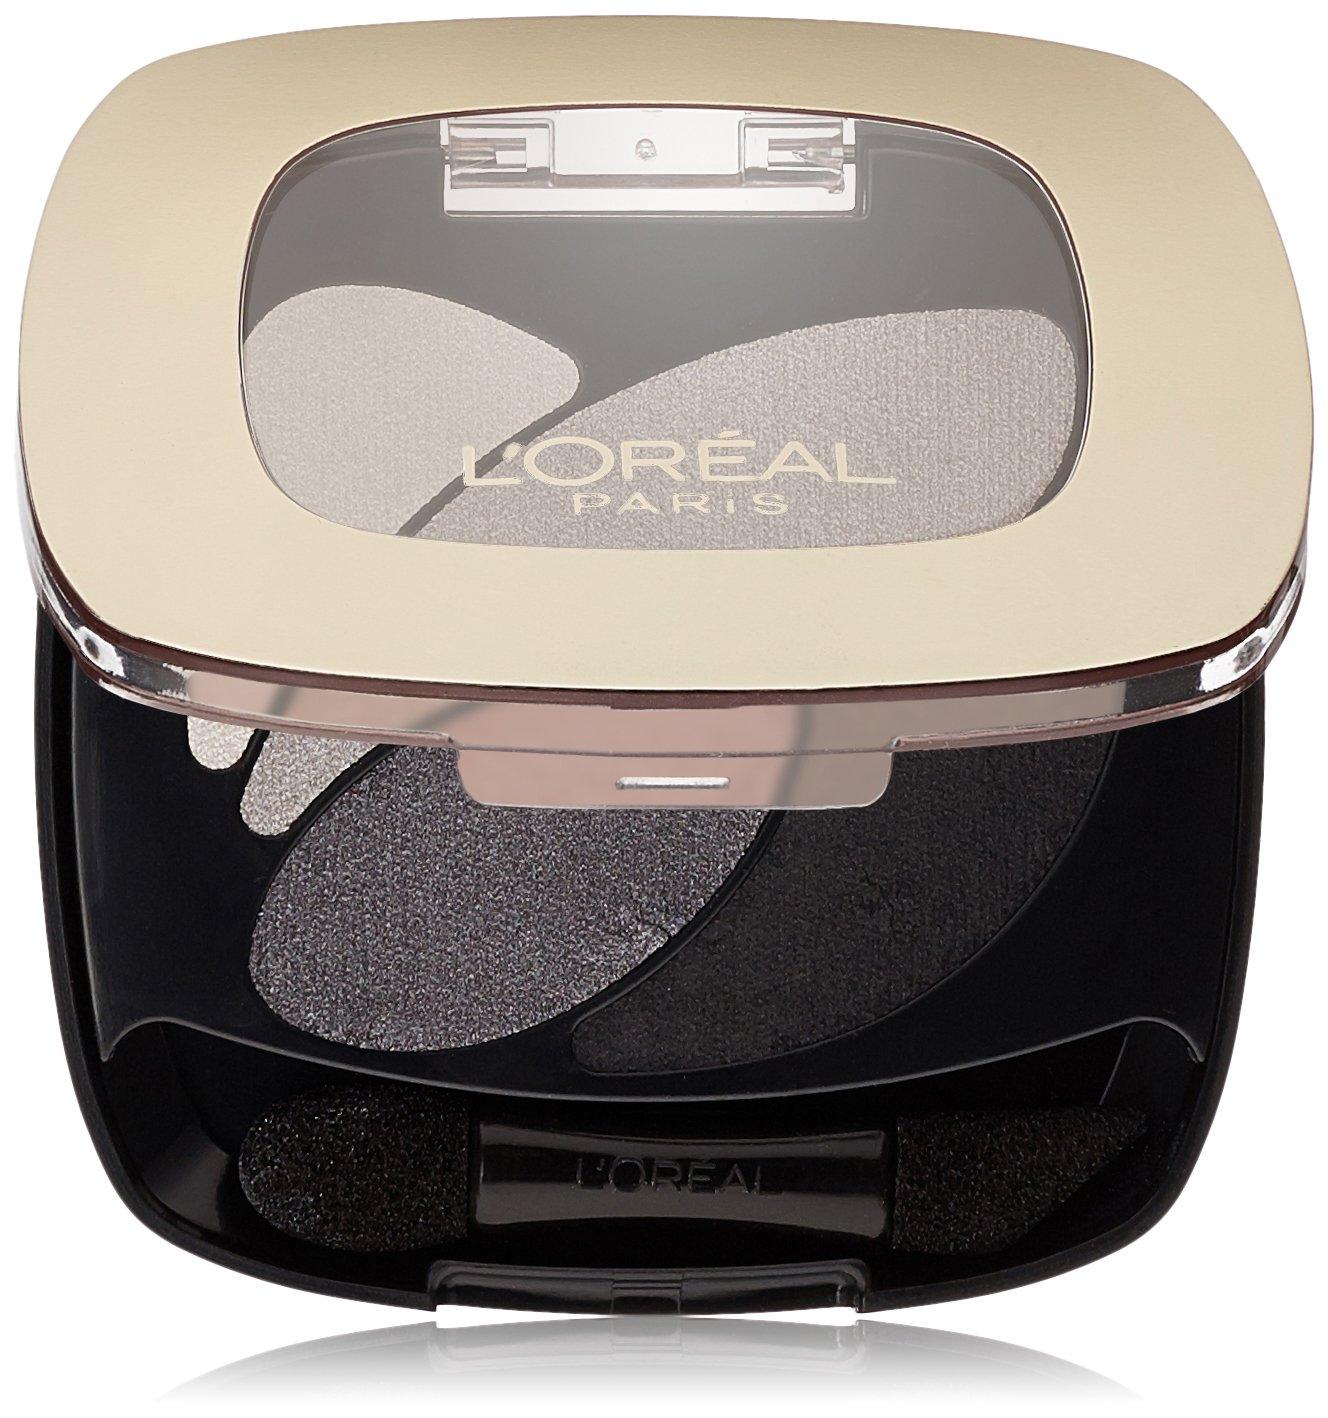 L'Oreal Paris Colour Riche Dual Effects Eyeshadow, Incredible Grey [260] 0.12 oz